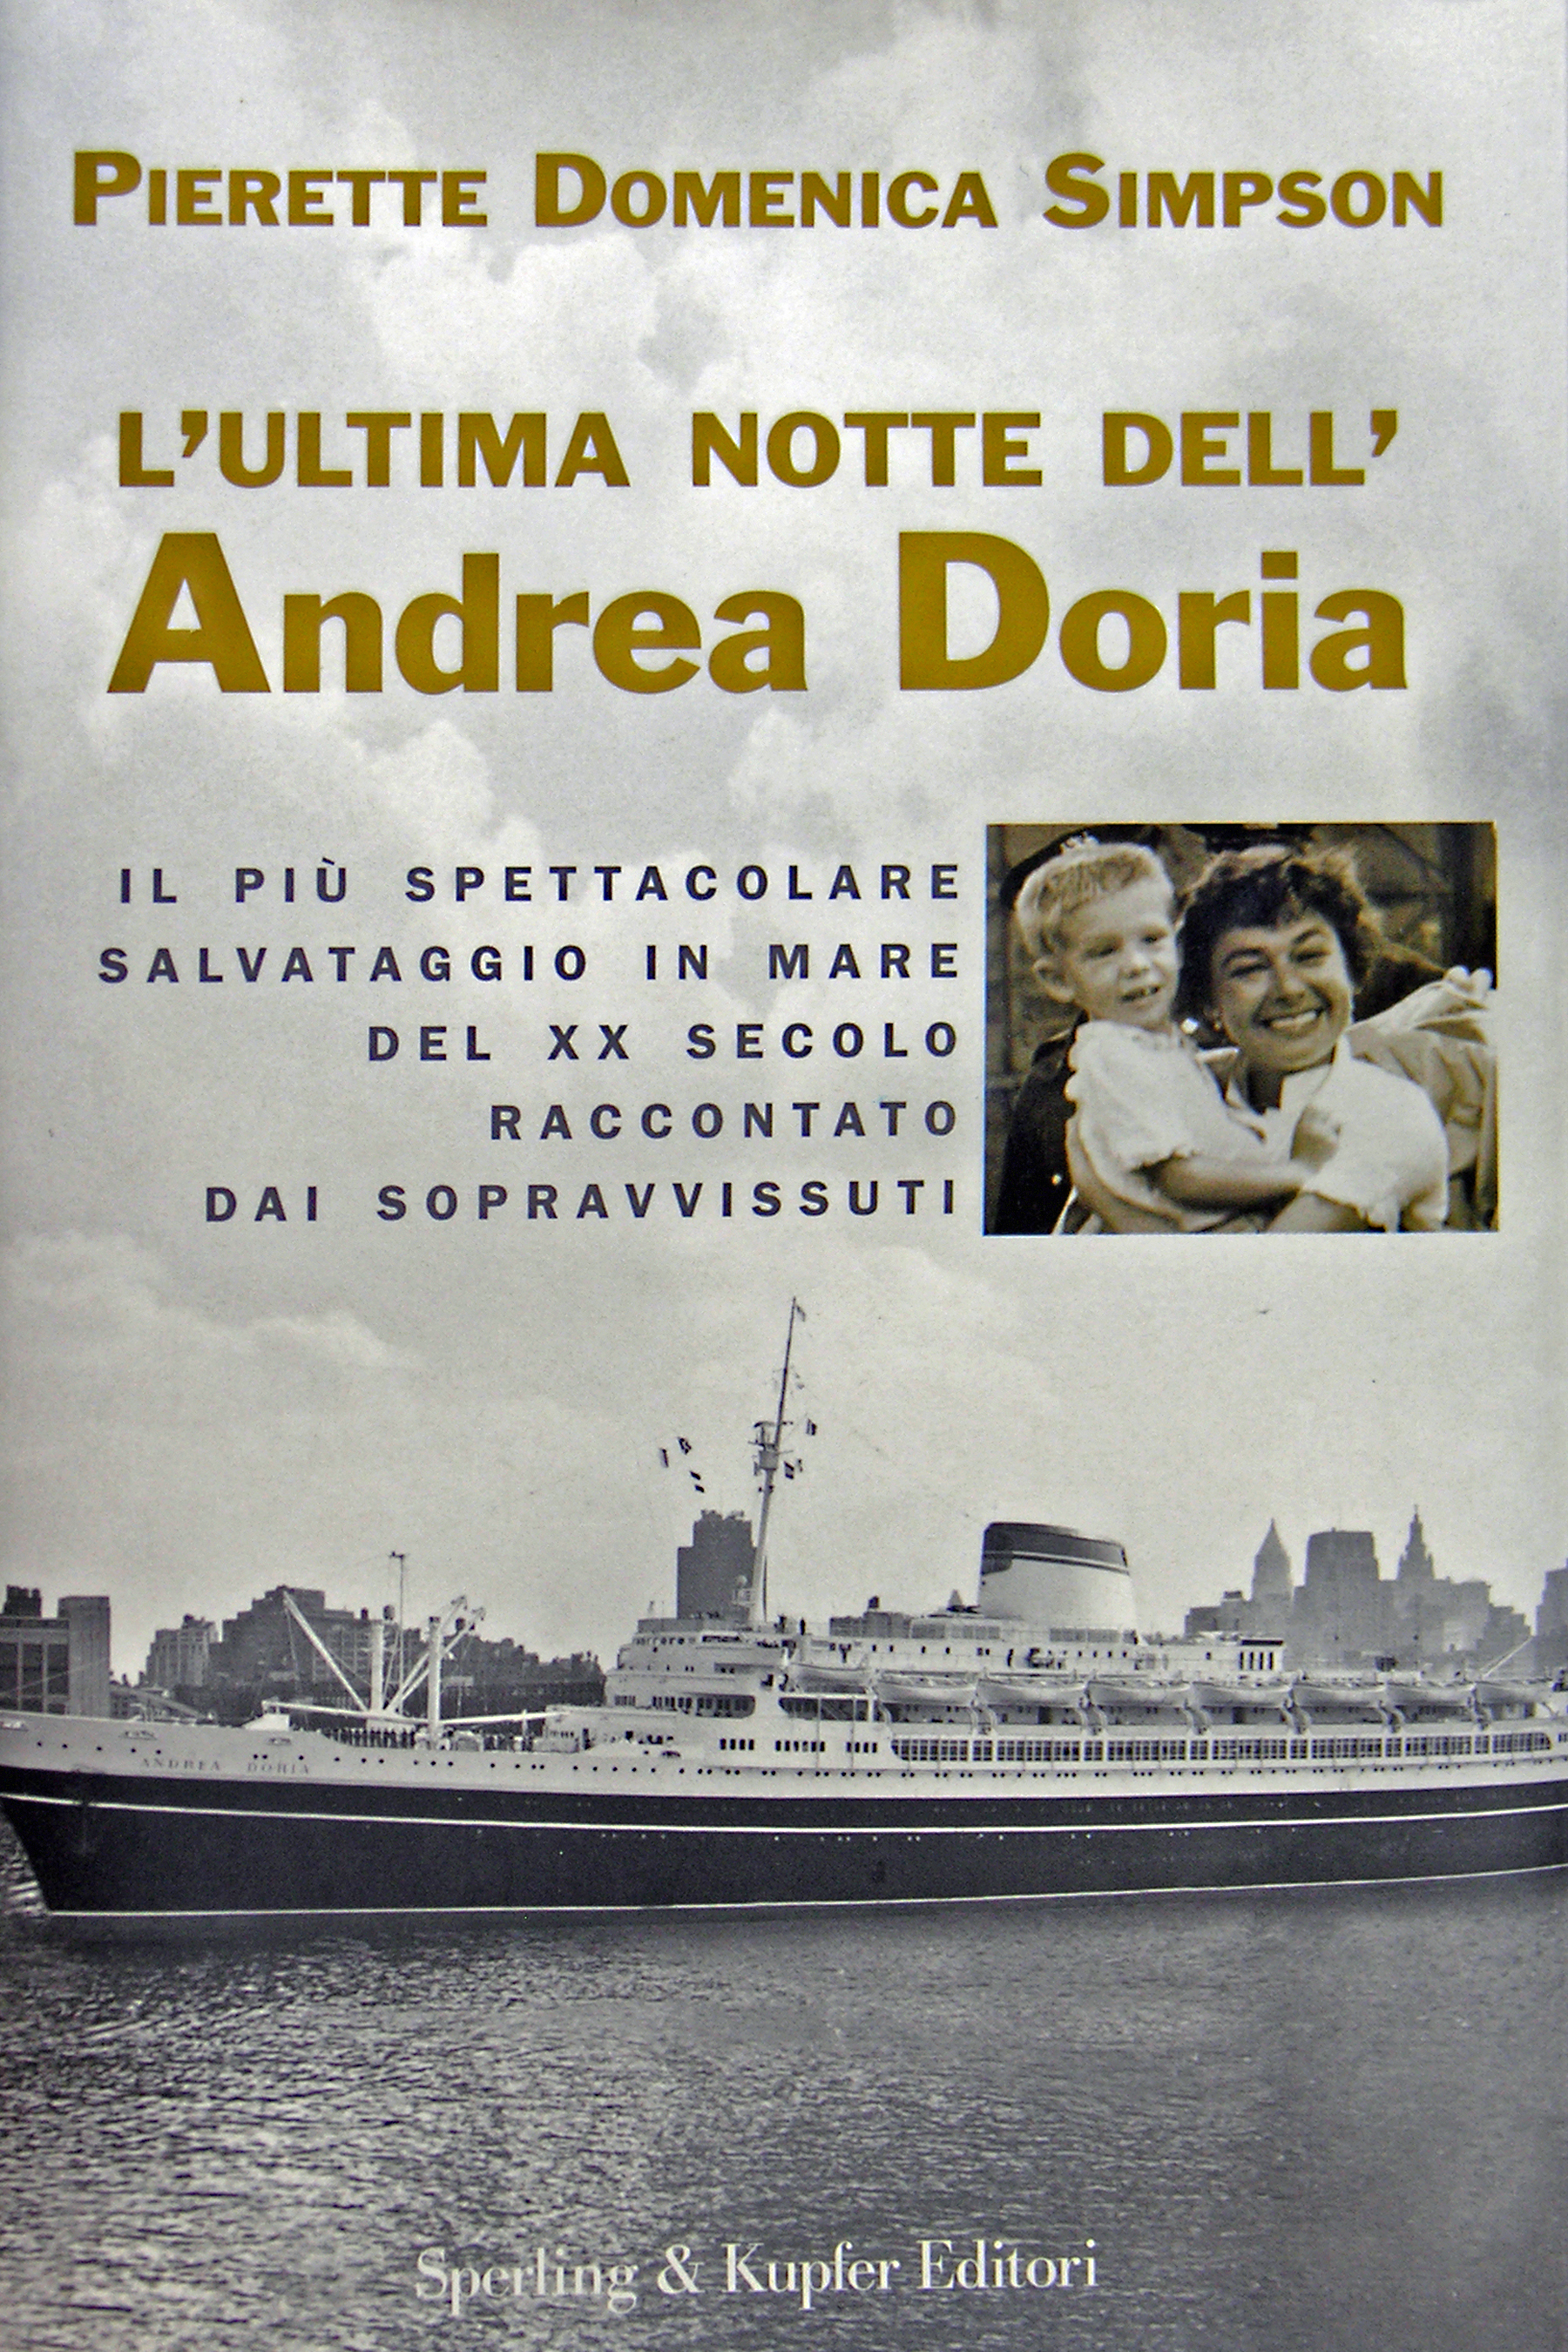 Italian Cookbook Cover : Photos for media use pierette simpson author speaker